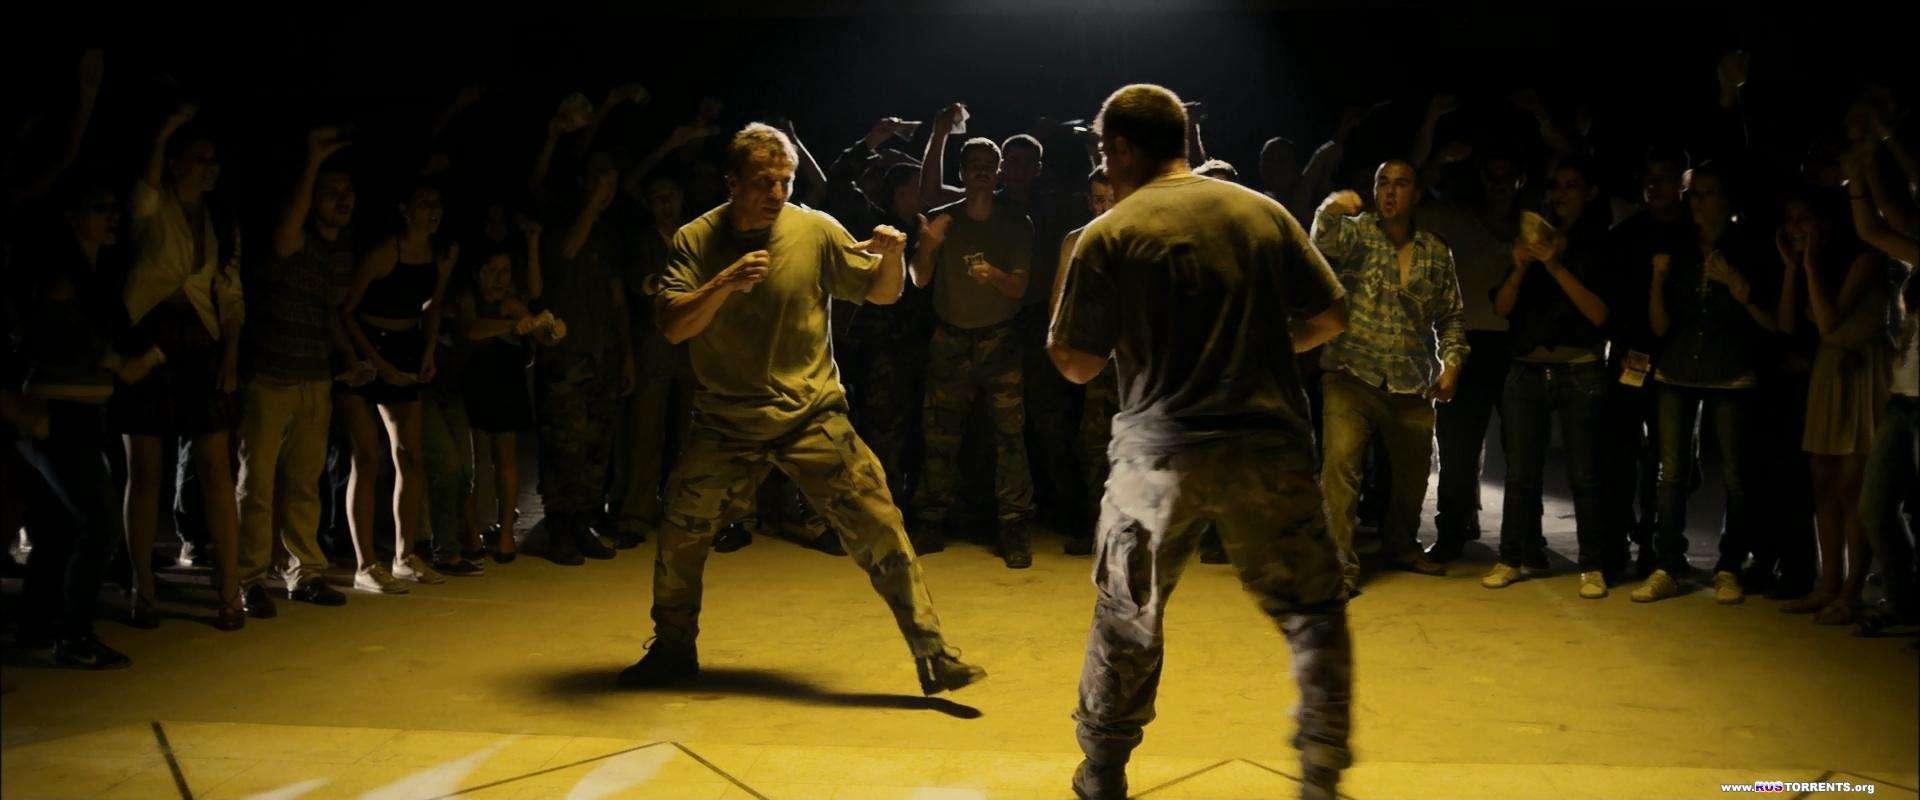 Уличный боец: Кулак убийцы | BDRip 1080p | А